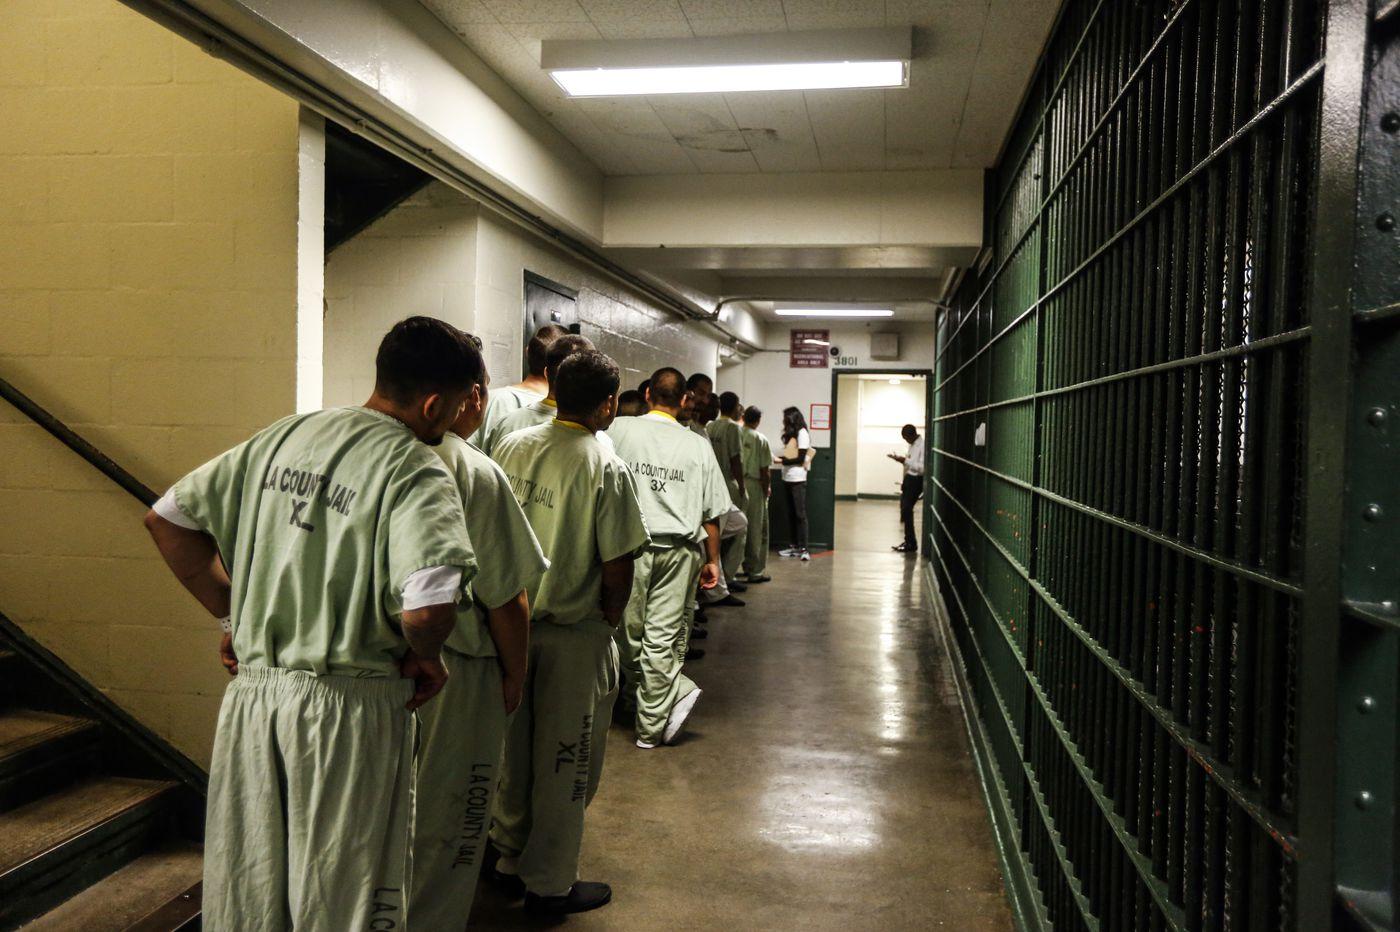 Should prison inmates be allowed to vote? Pro/Con | Opinion